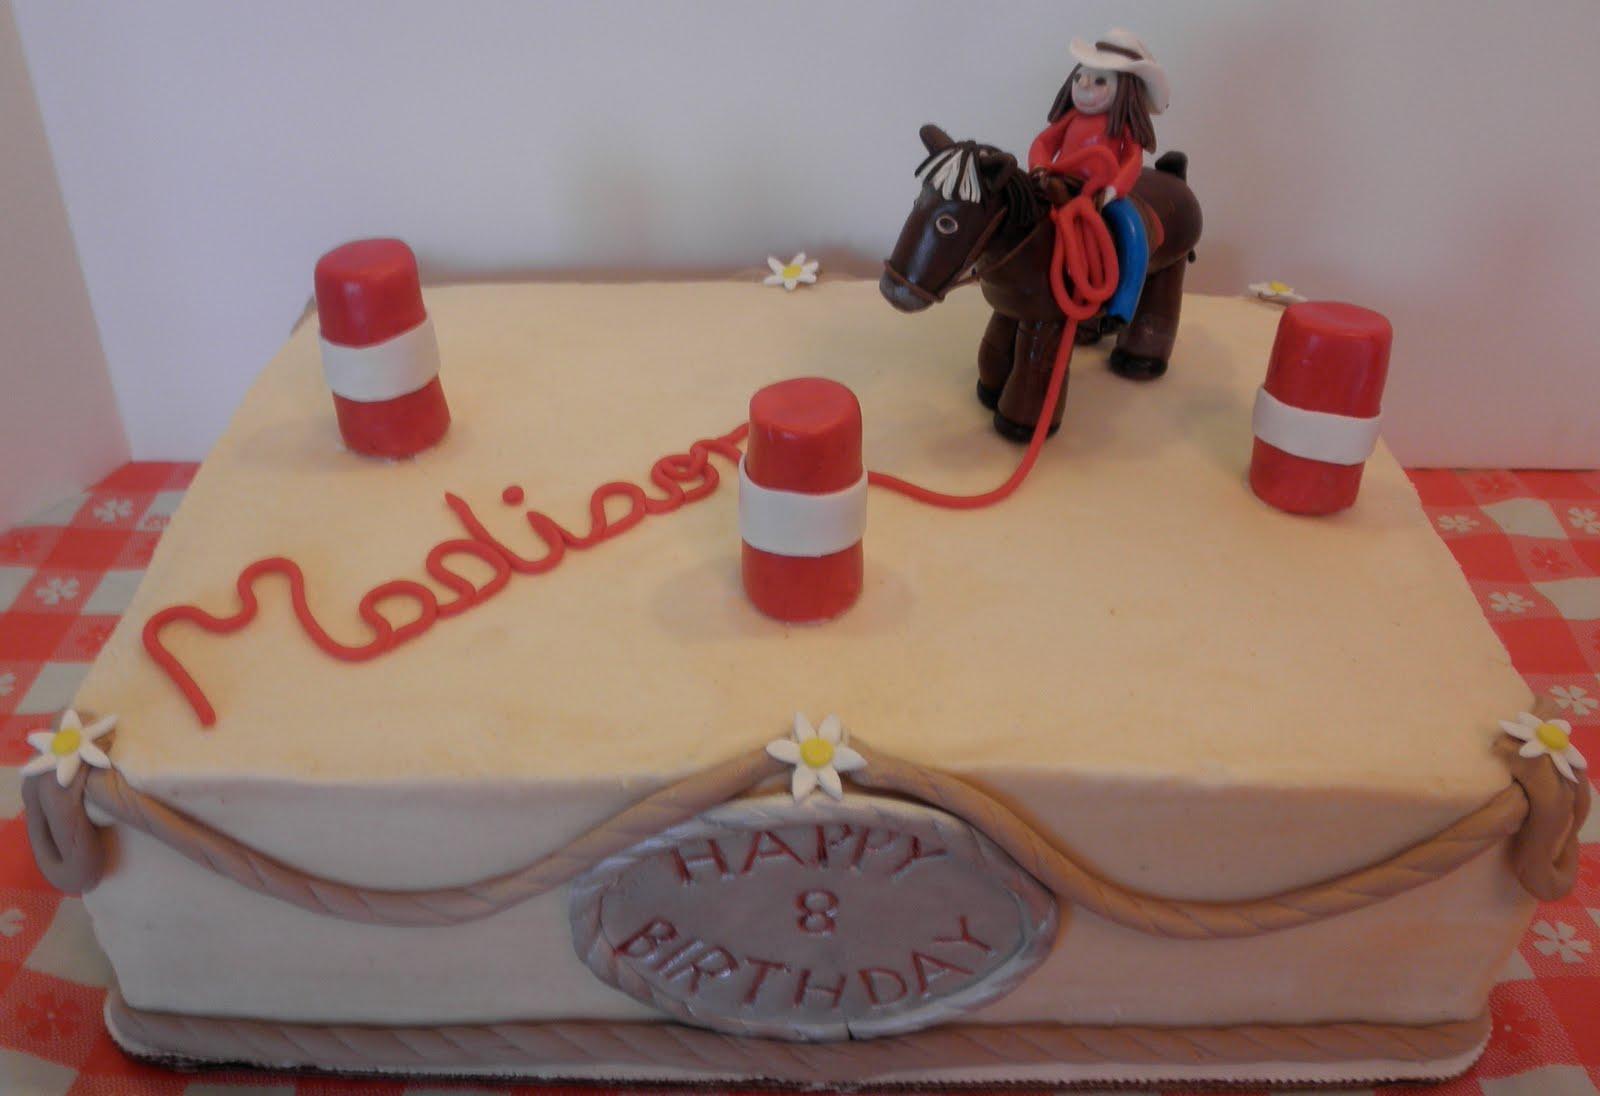 Sweet Ts Cake Design Horse And Barrel Racing Birthday Sheetcake